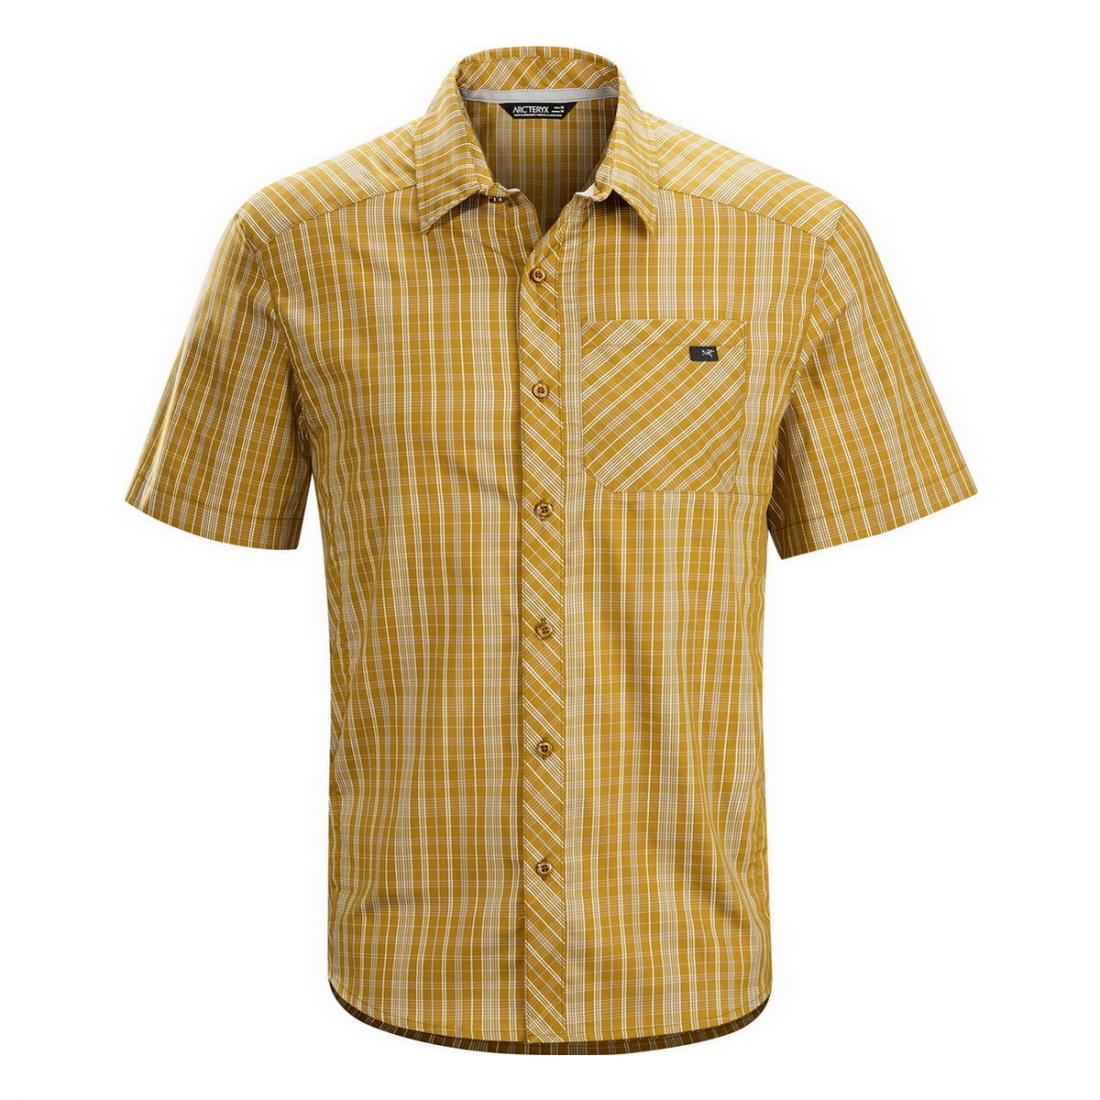 Рубашка Peakline Shirt SS муж.Рубашки<br><br><br>Цвет: Коричневый<br>Размер: L